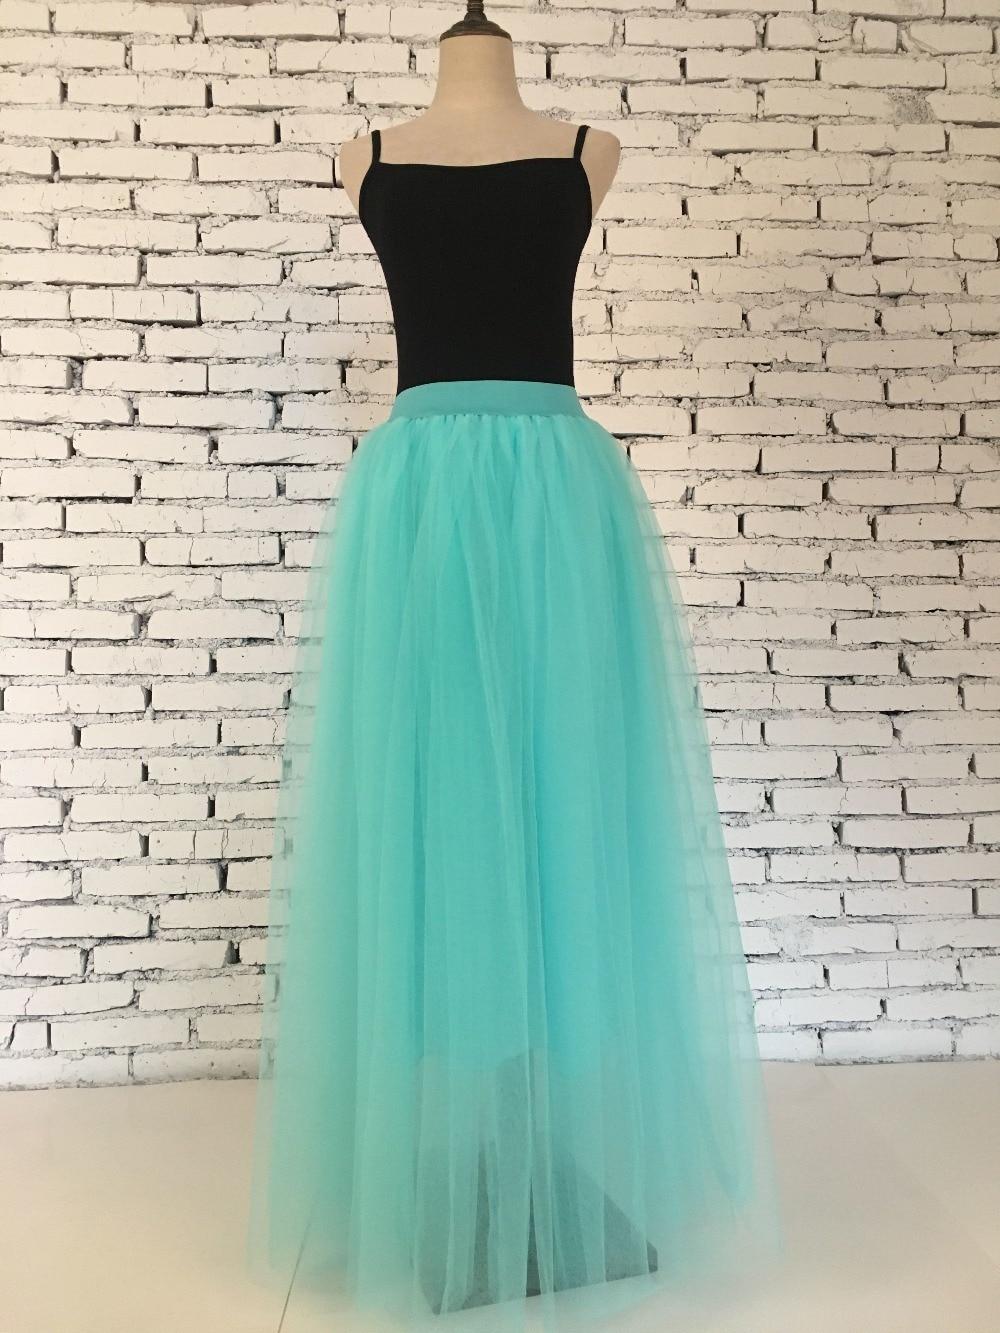 Light Green Faldas 100cm Maxi Long Tulle Skirts Womens Girls Autumn Jupe Party Prom Underskirt Petticoat Tt006